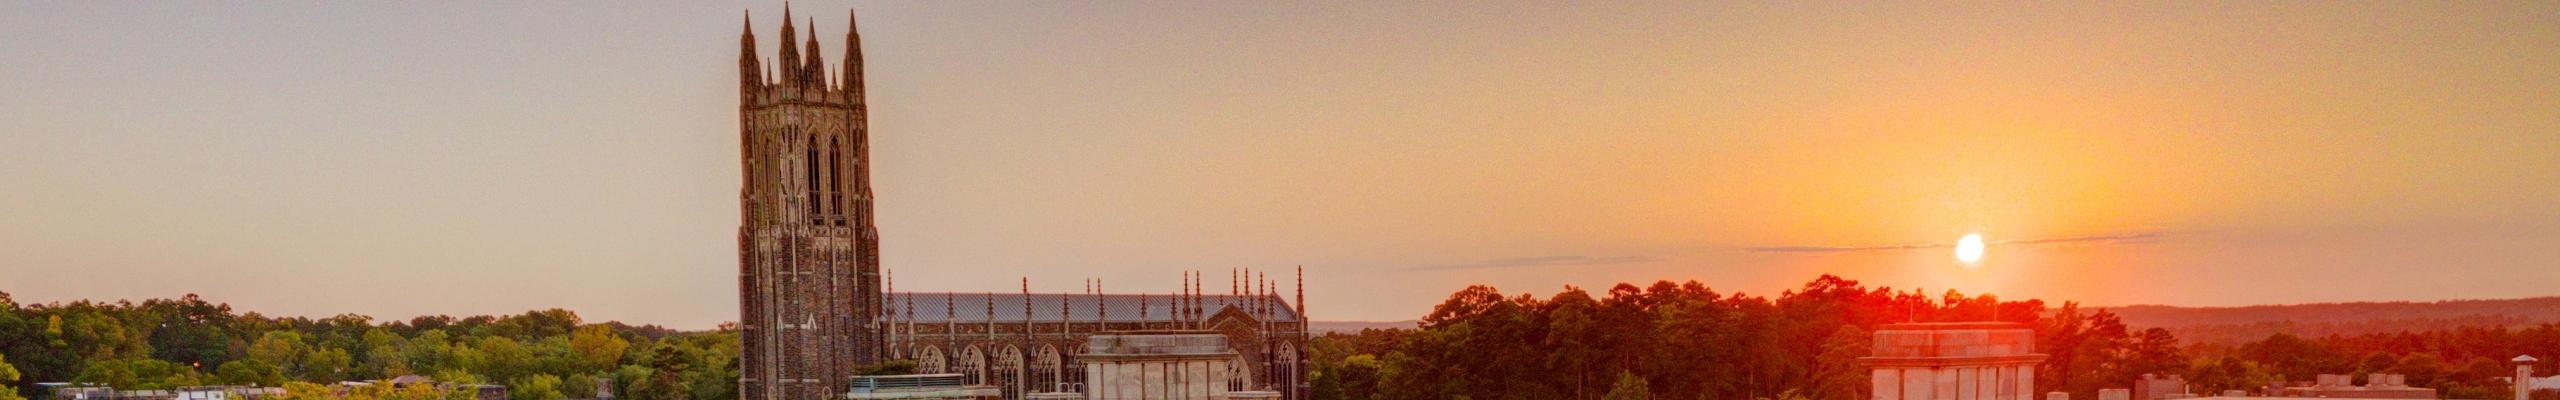 Skyline view of Duke Chapel at sunrise.